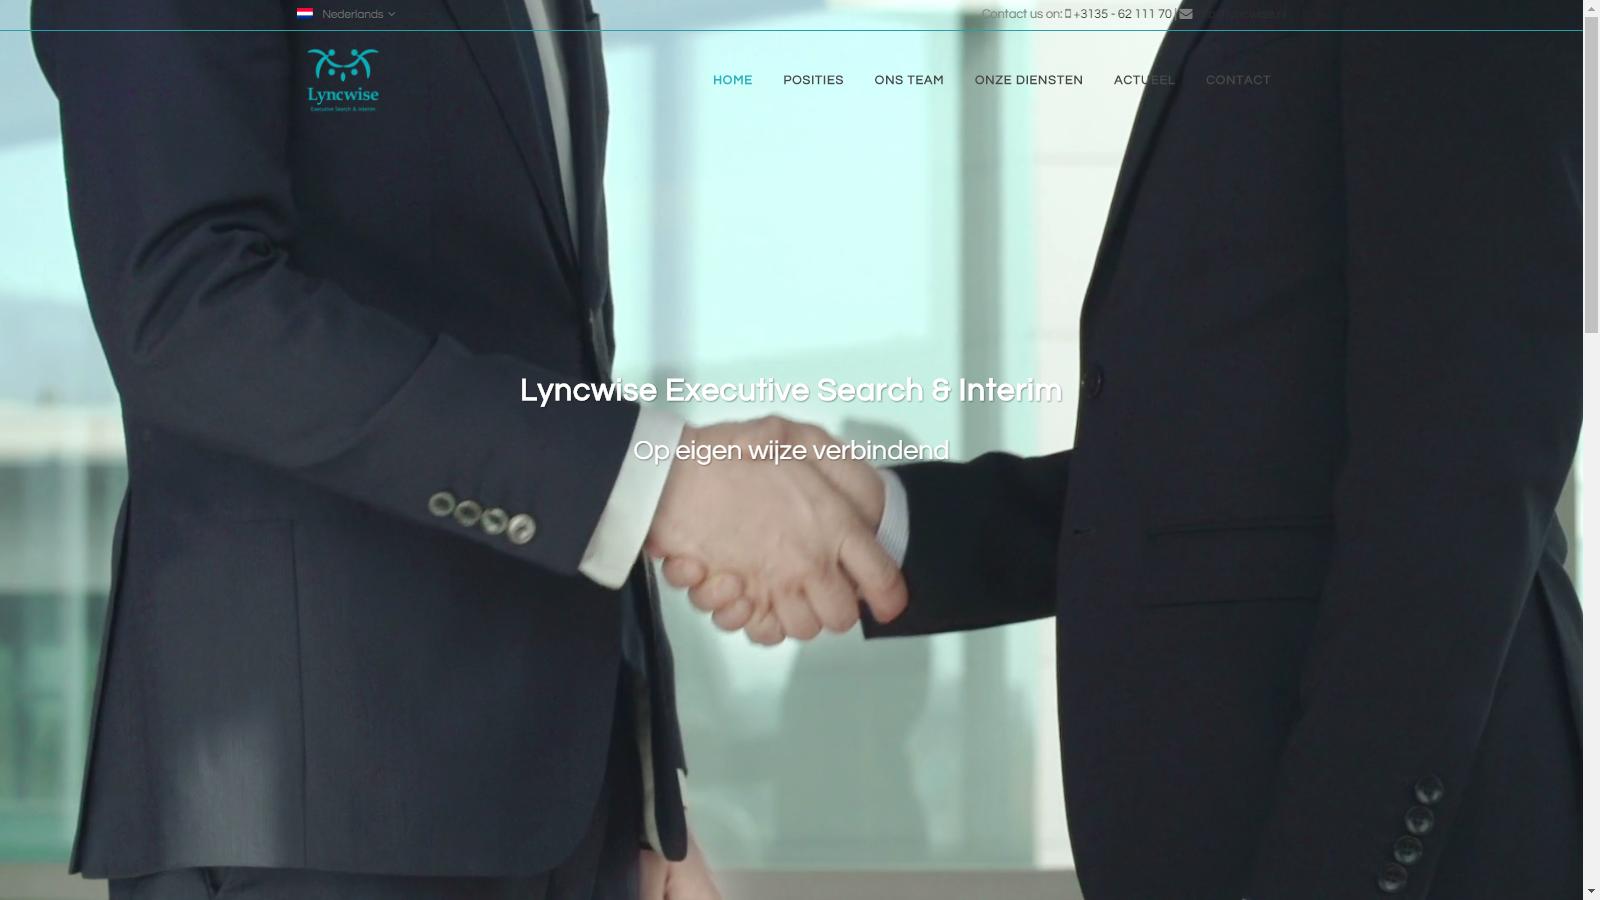 Lyncwise-heeft-een-nieuwe-site-lyncwise.nl